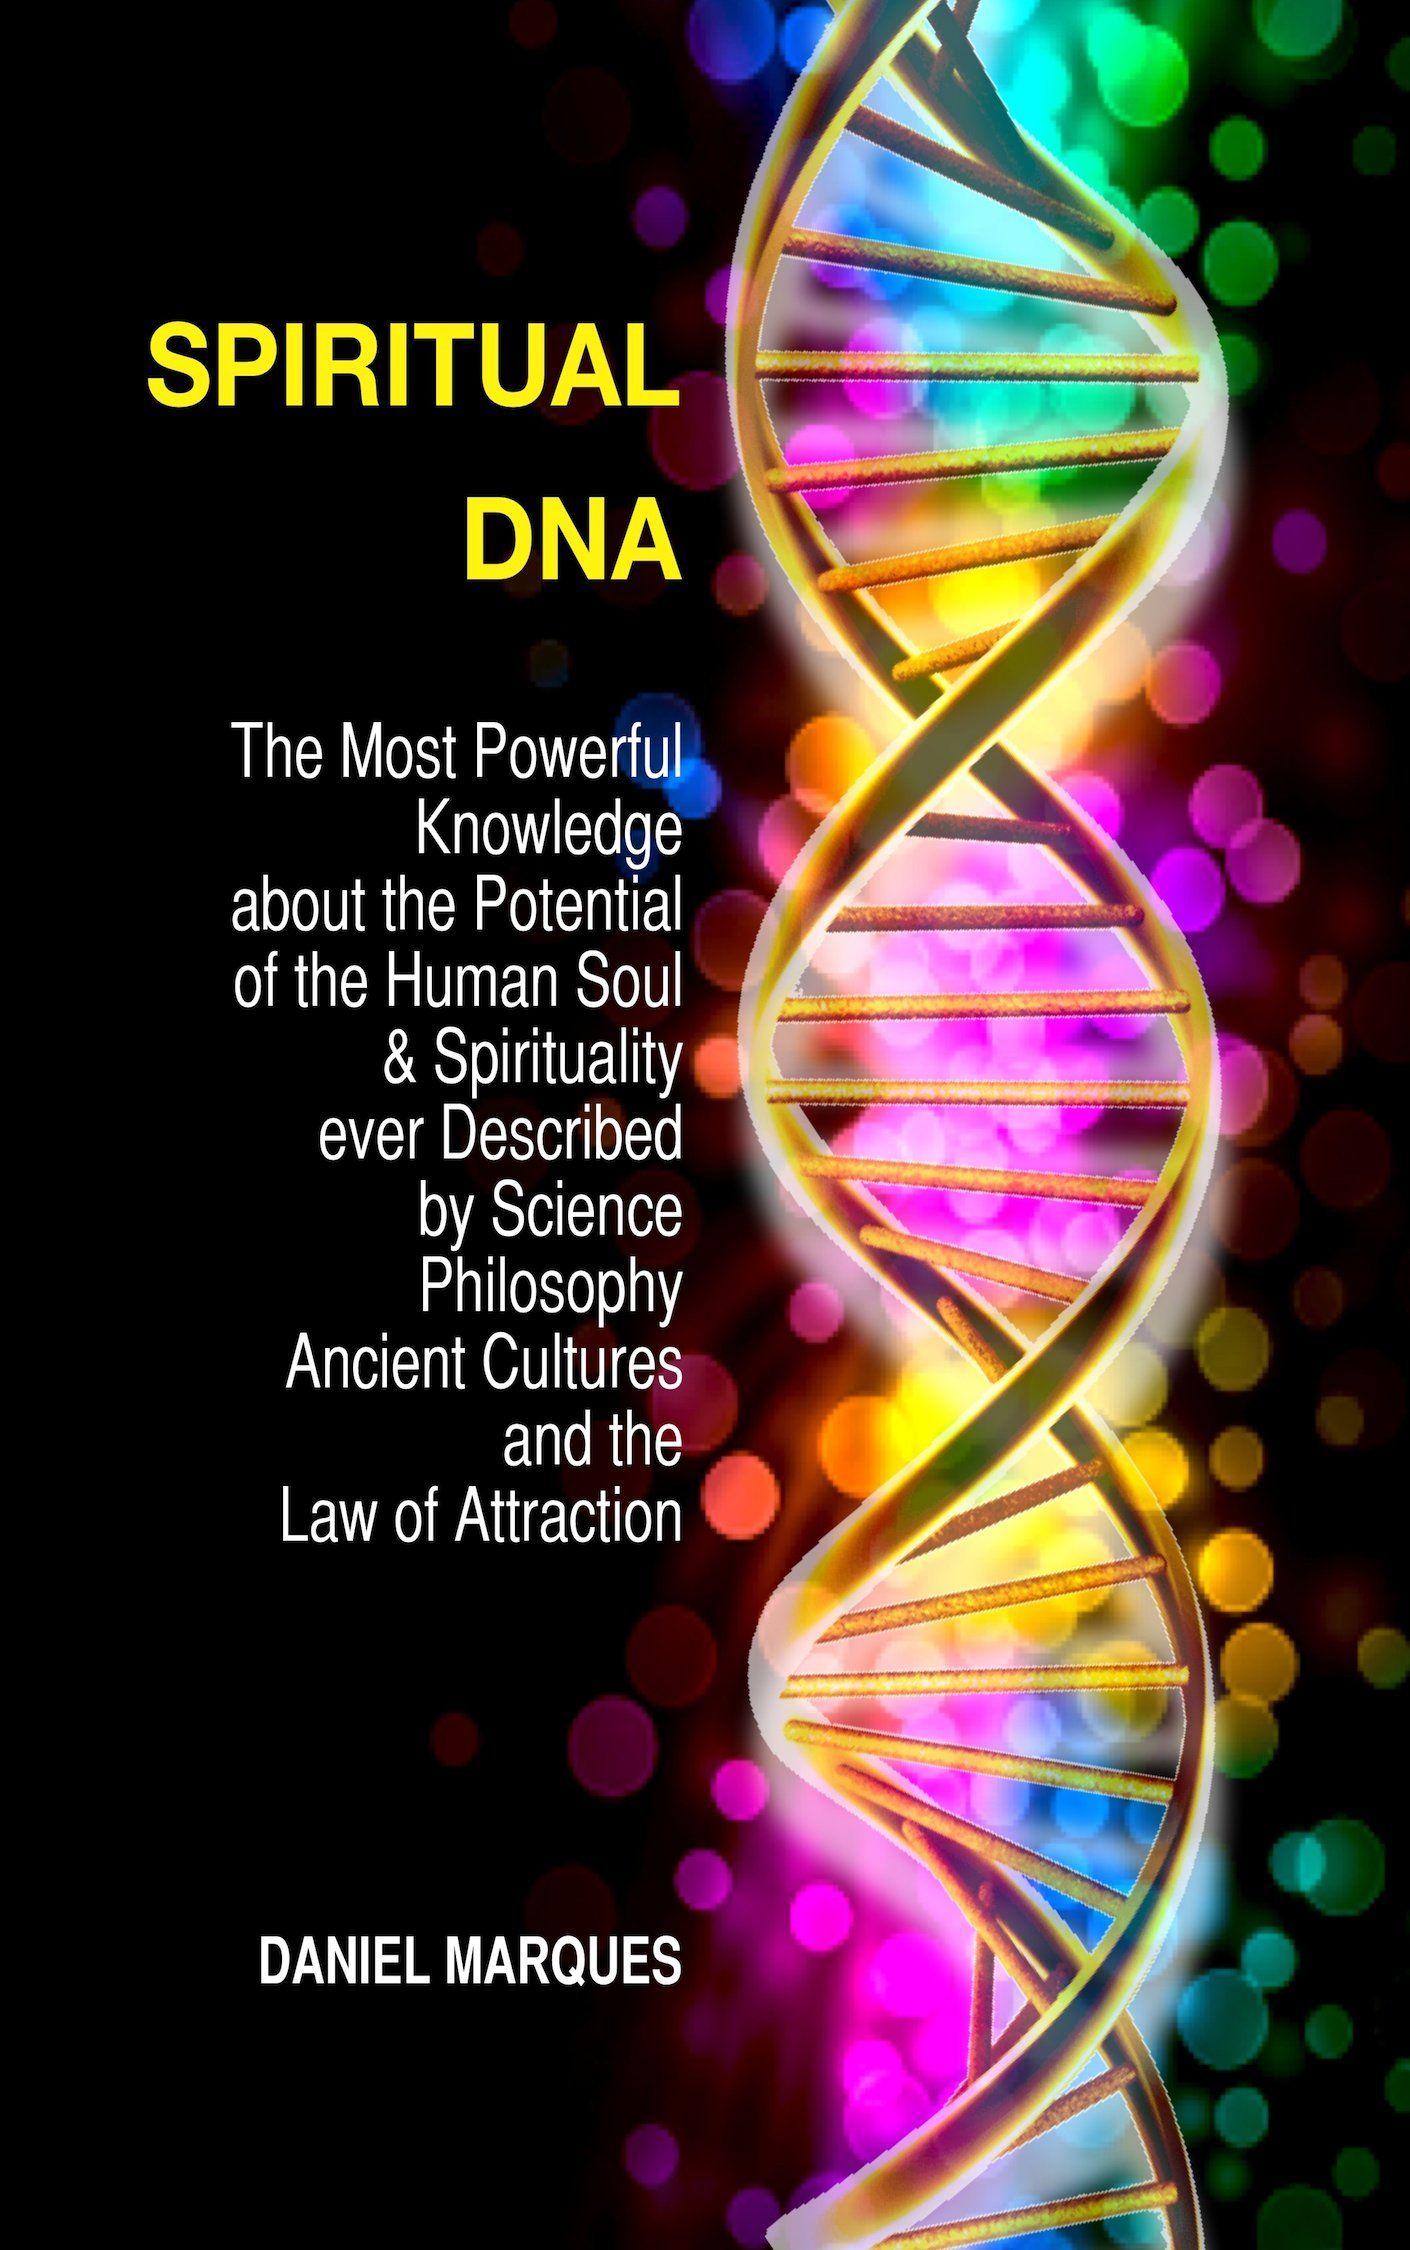 Spiritual DNA (ebook)   PROMOTIONS in 2019   Spirituality